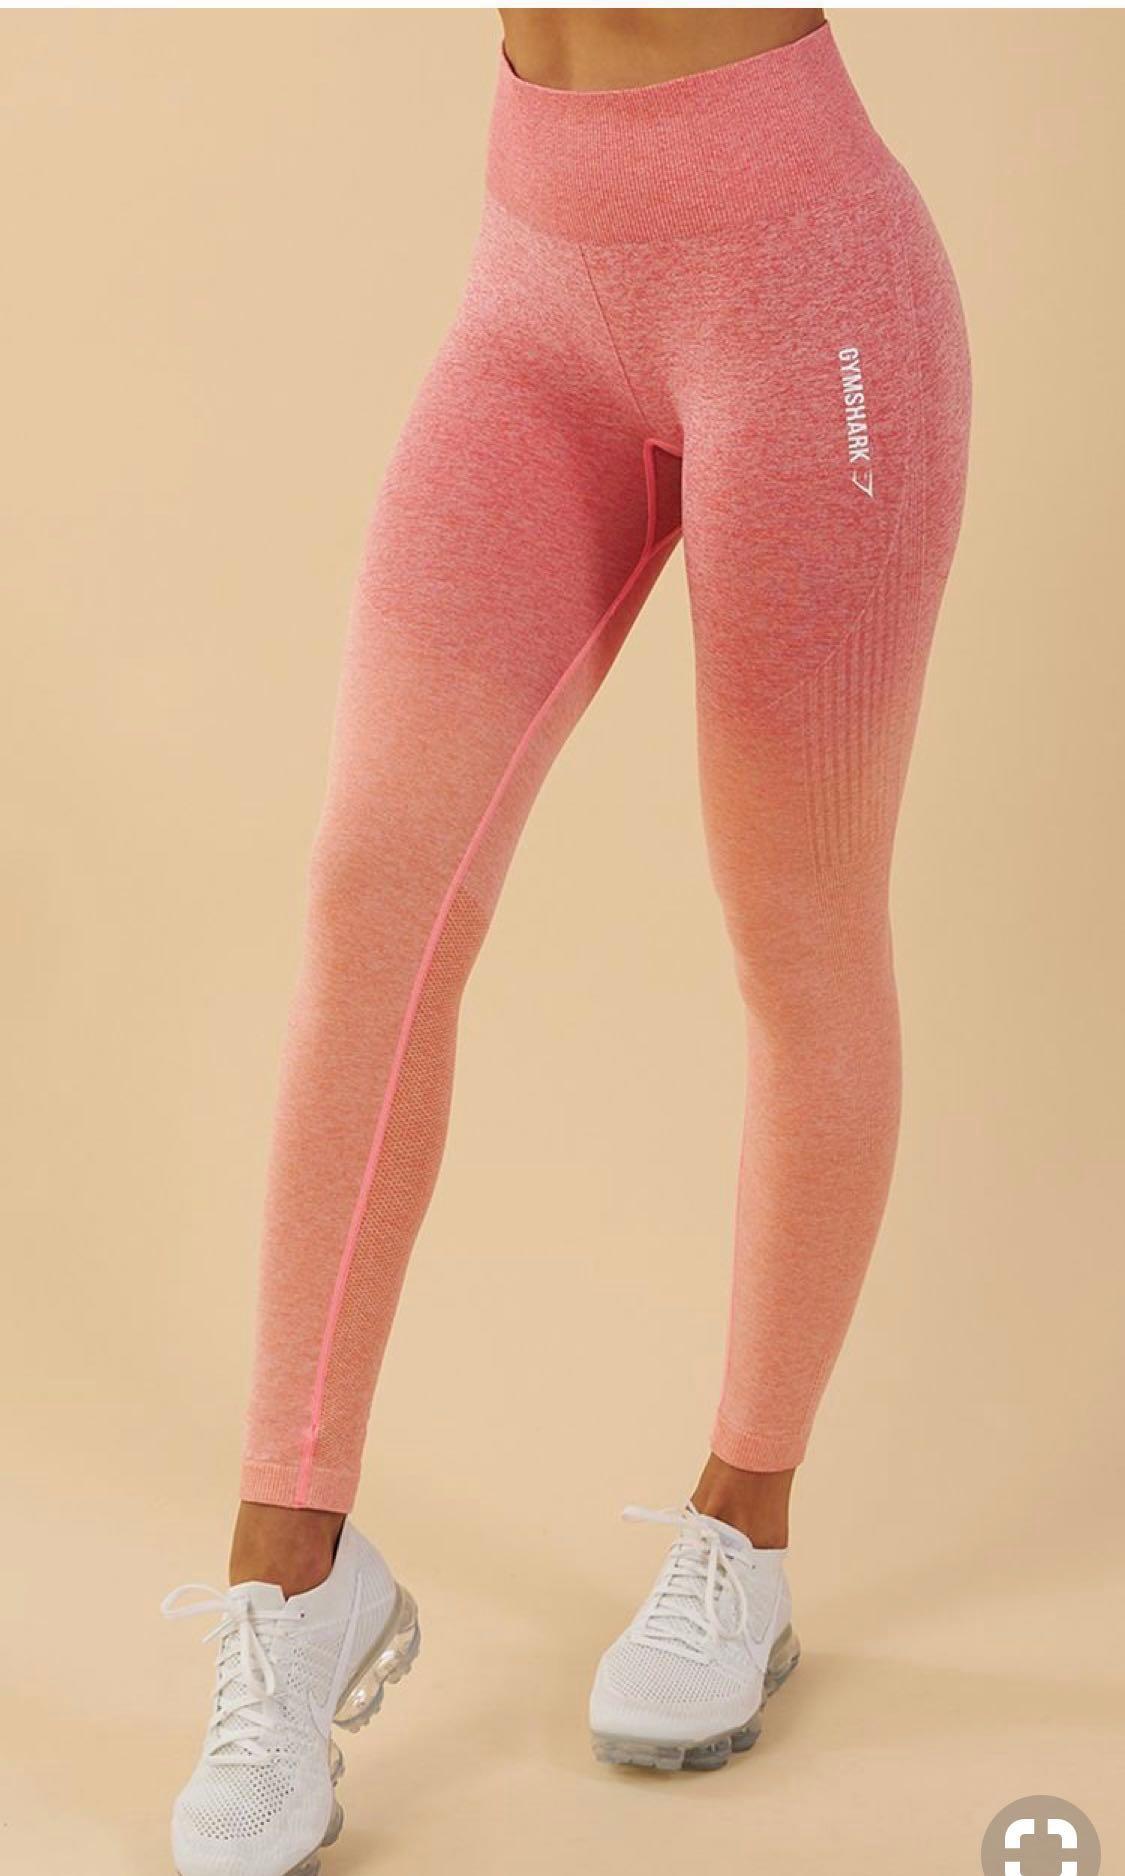 c1f1bc0707c070 Gymshark Ombré Seamless Leggings - Peach Coral, Sports, Sports ...